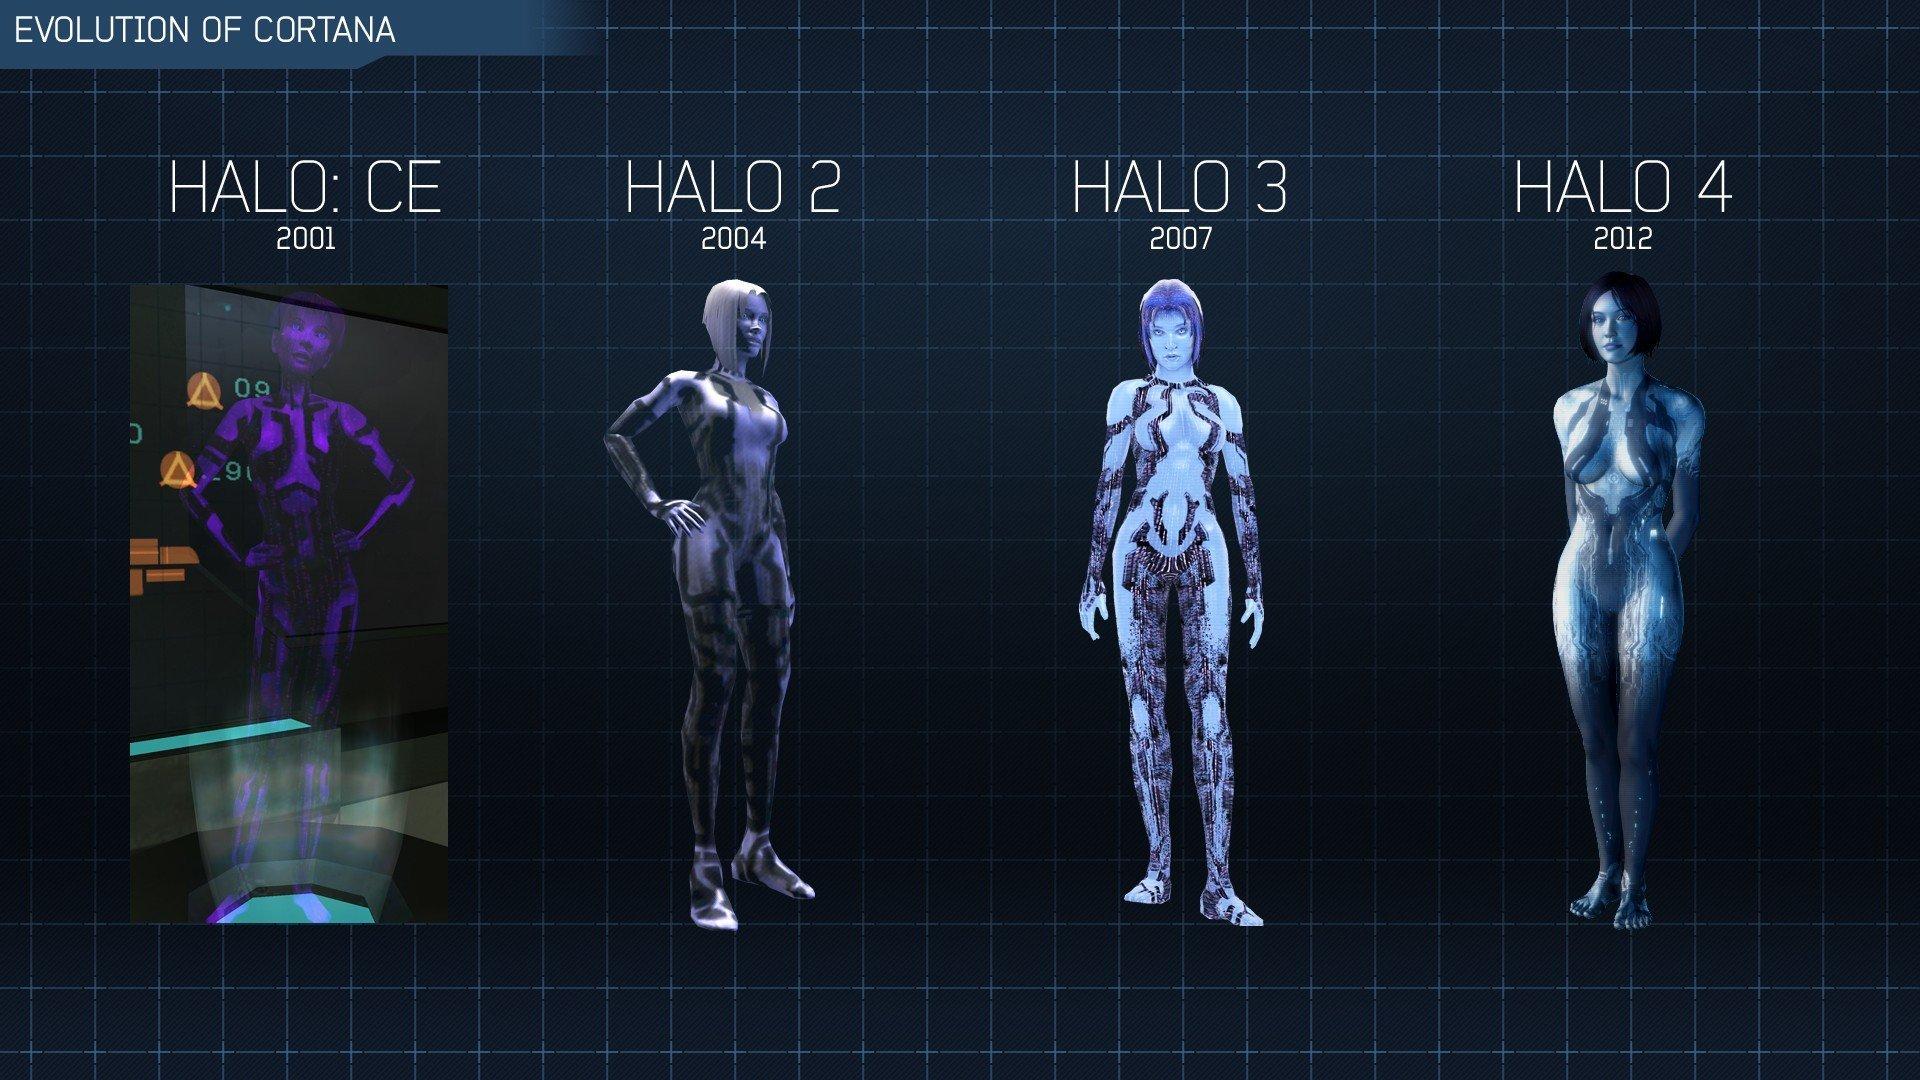 Video games Cortana Halo evolution Halo 4 Halo 2 wallpaper 1920x1080 1920x1080